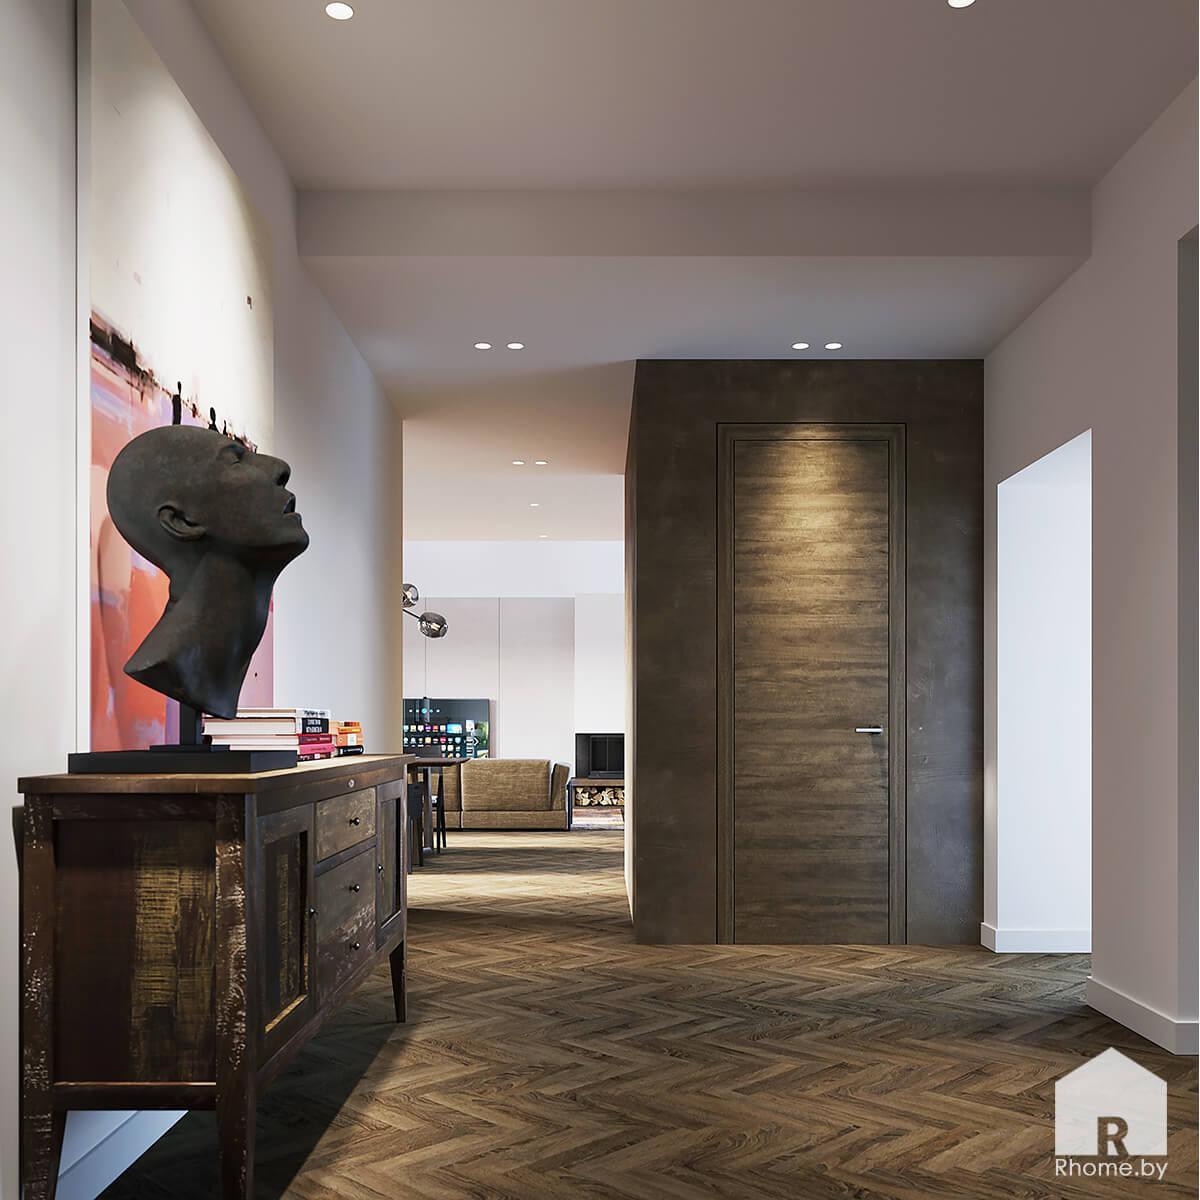 Дизайн холла | Дизайн студия – Rhome.by